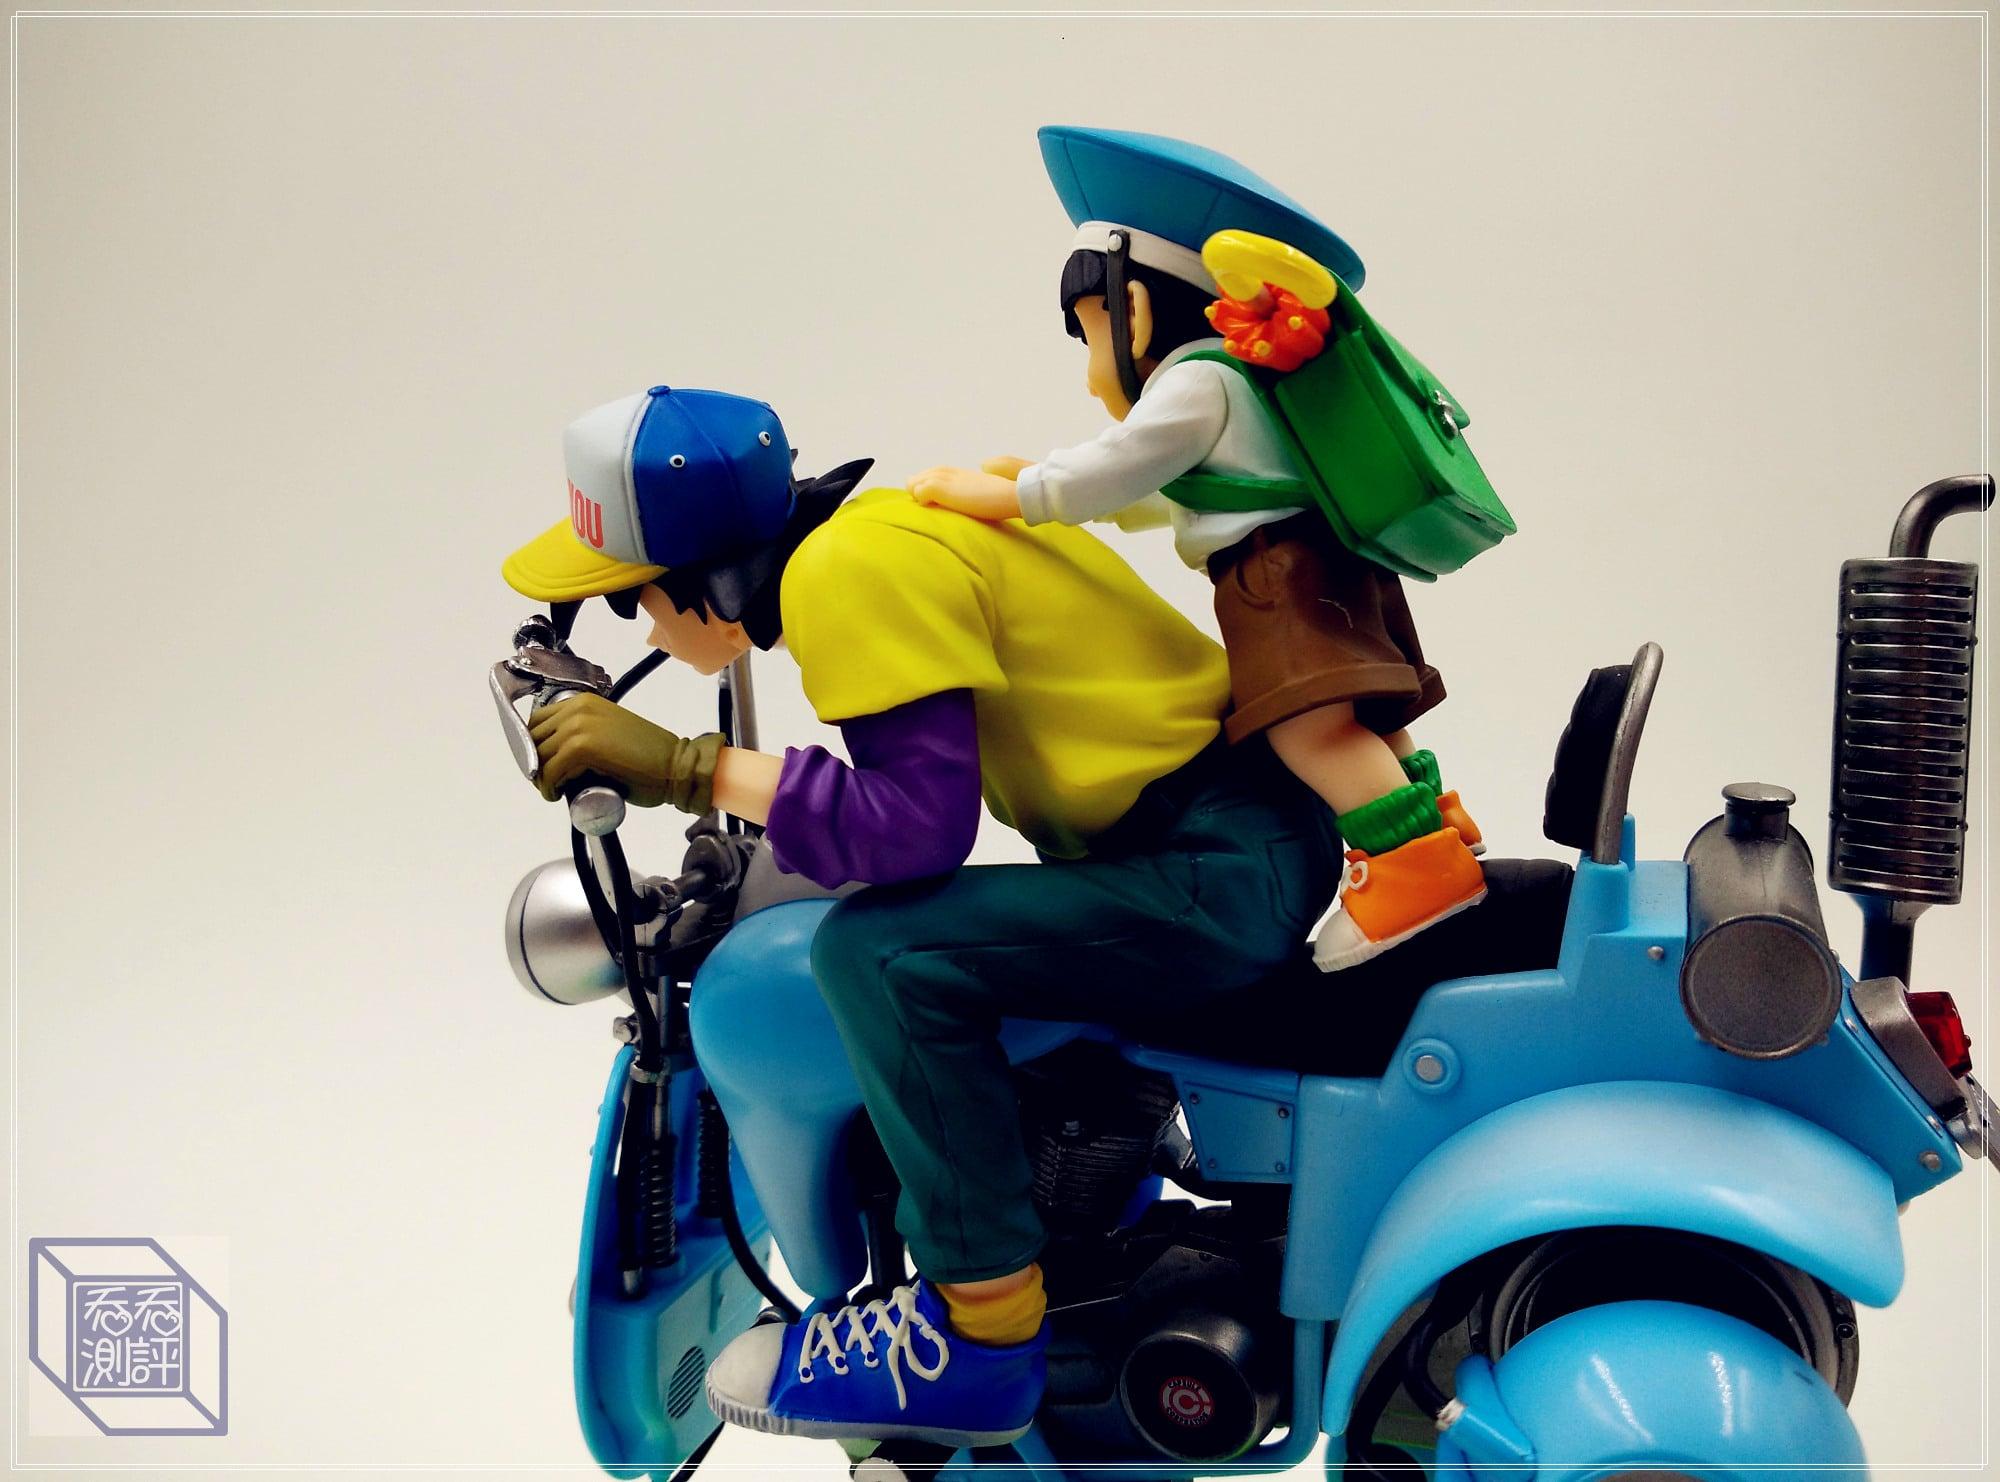 DRAGON BALL Son Gokū & Sun Gōhan motorcycle statue collectibles-Garage Kit Dolls